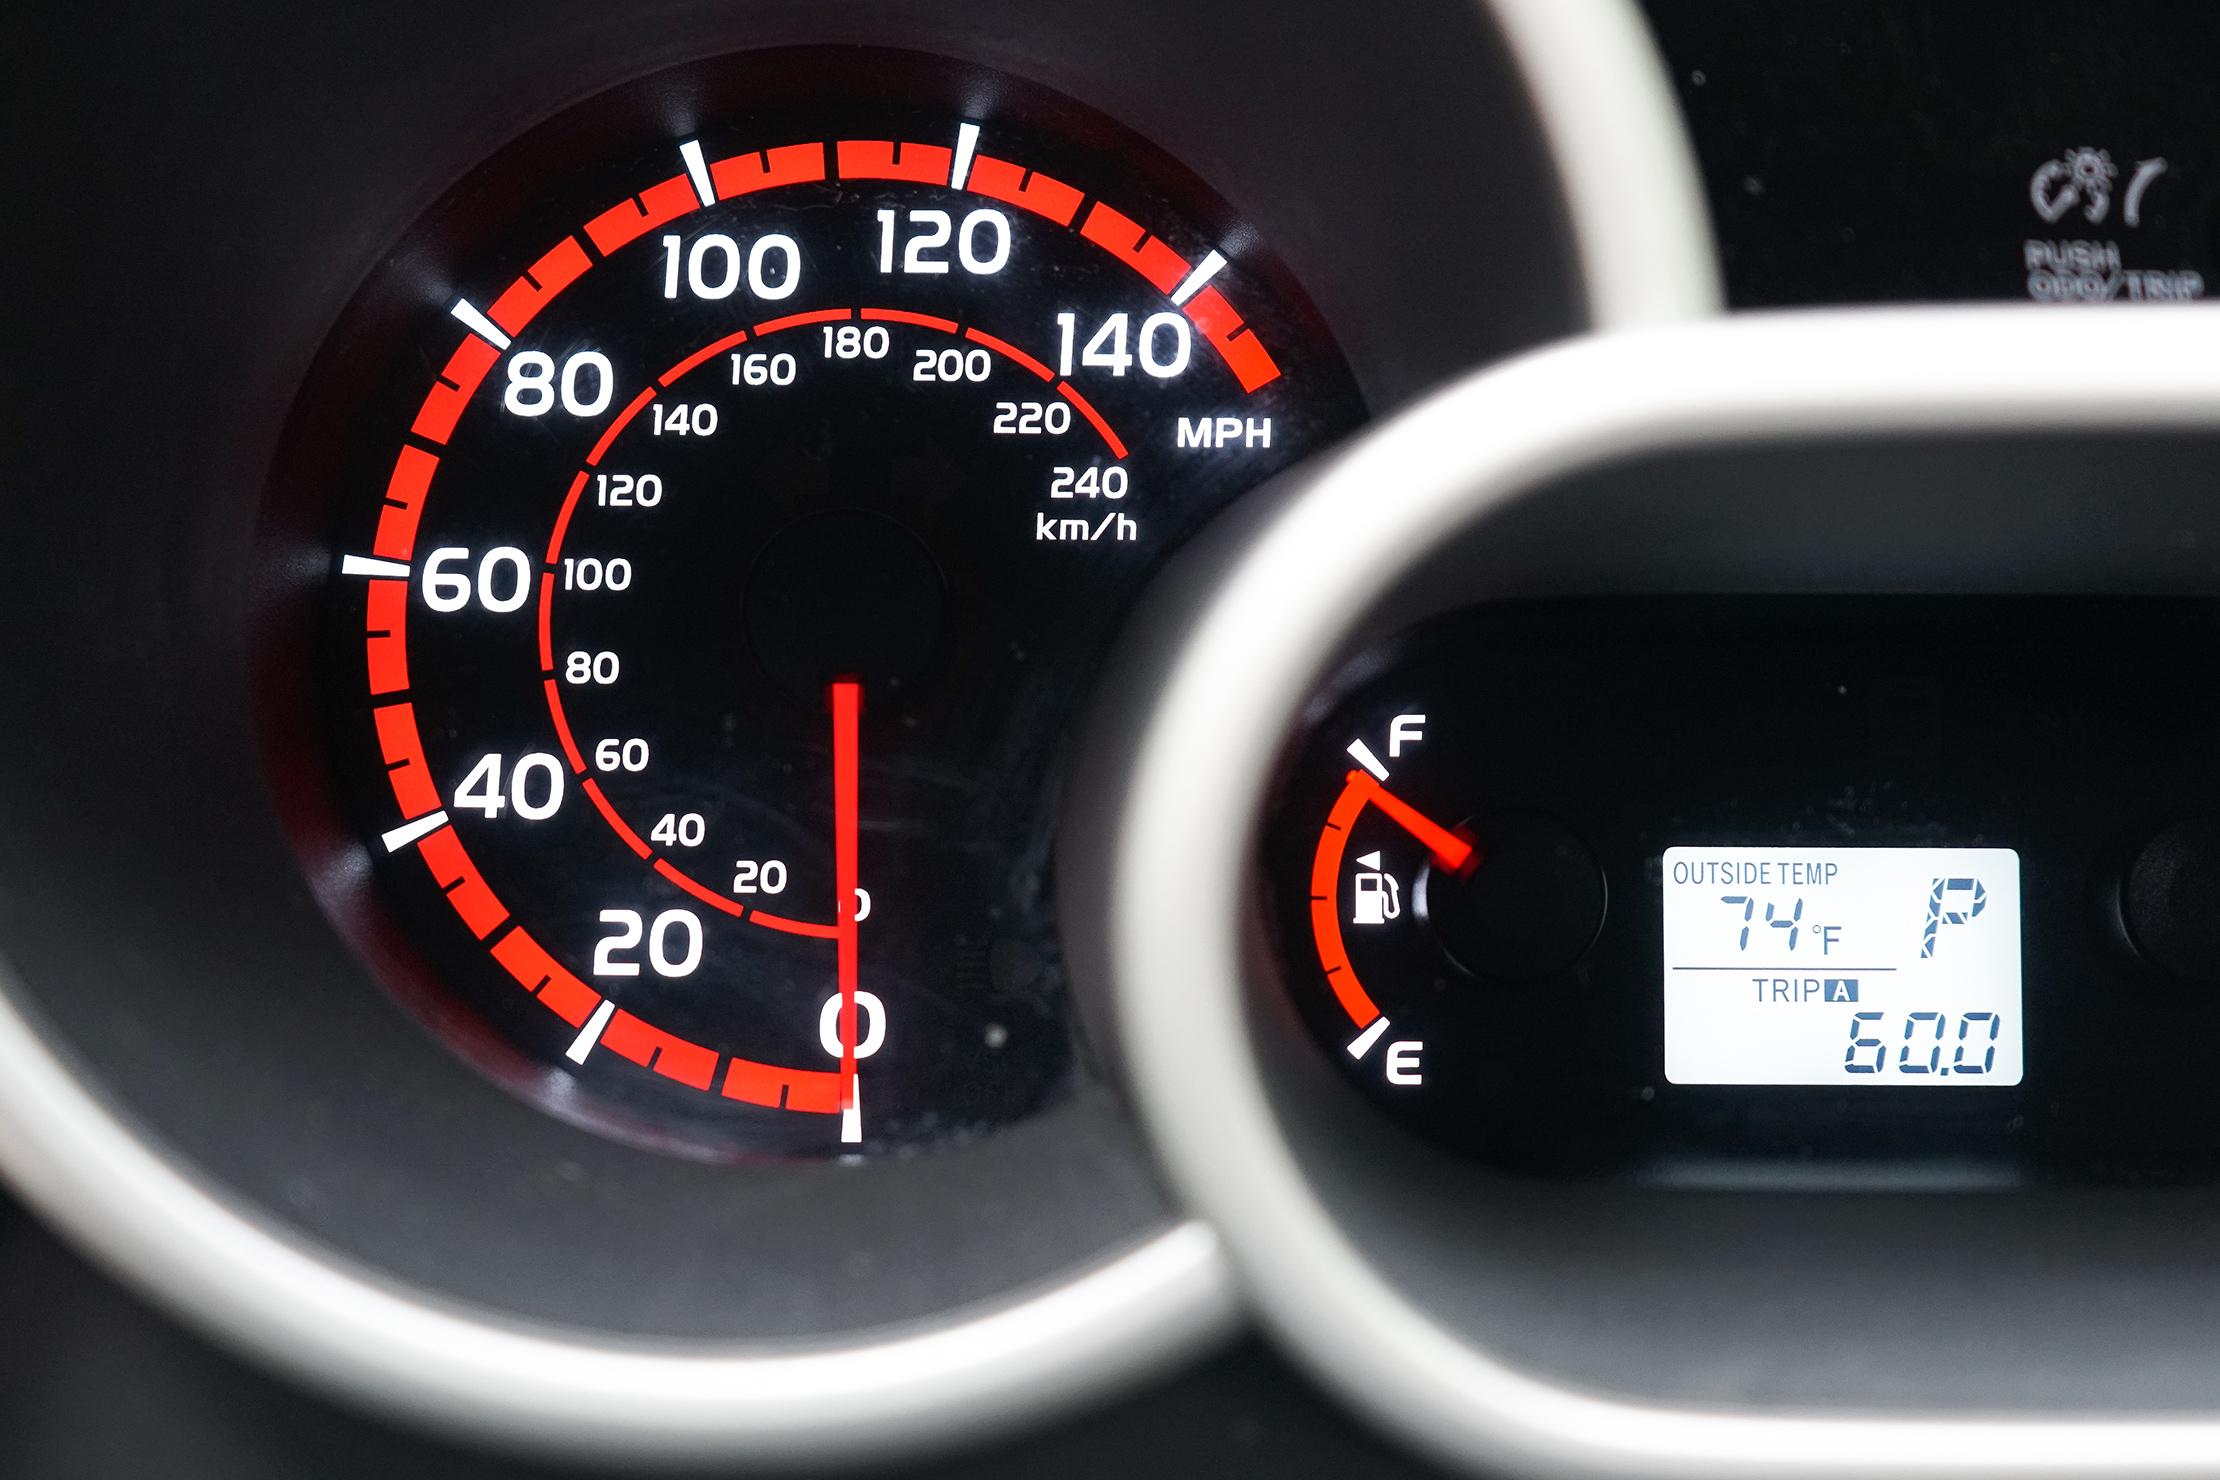 Fuel Gauge Road Trip Guide